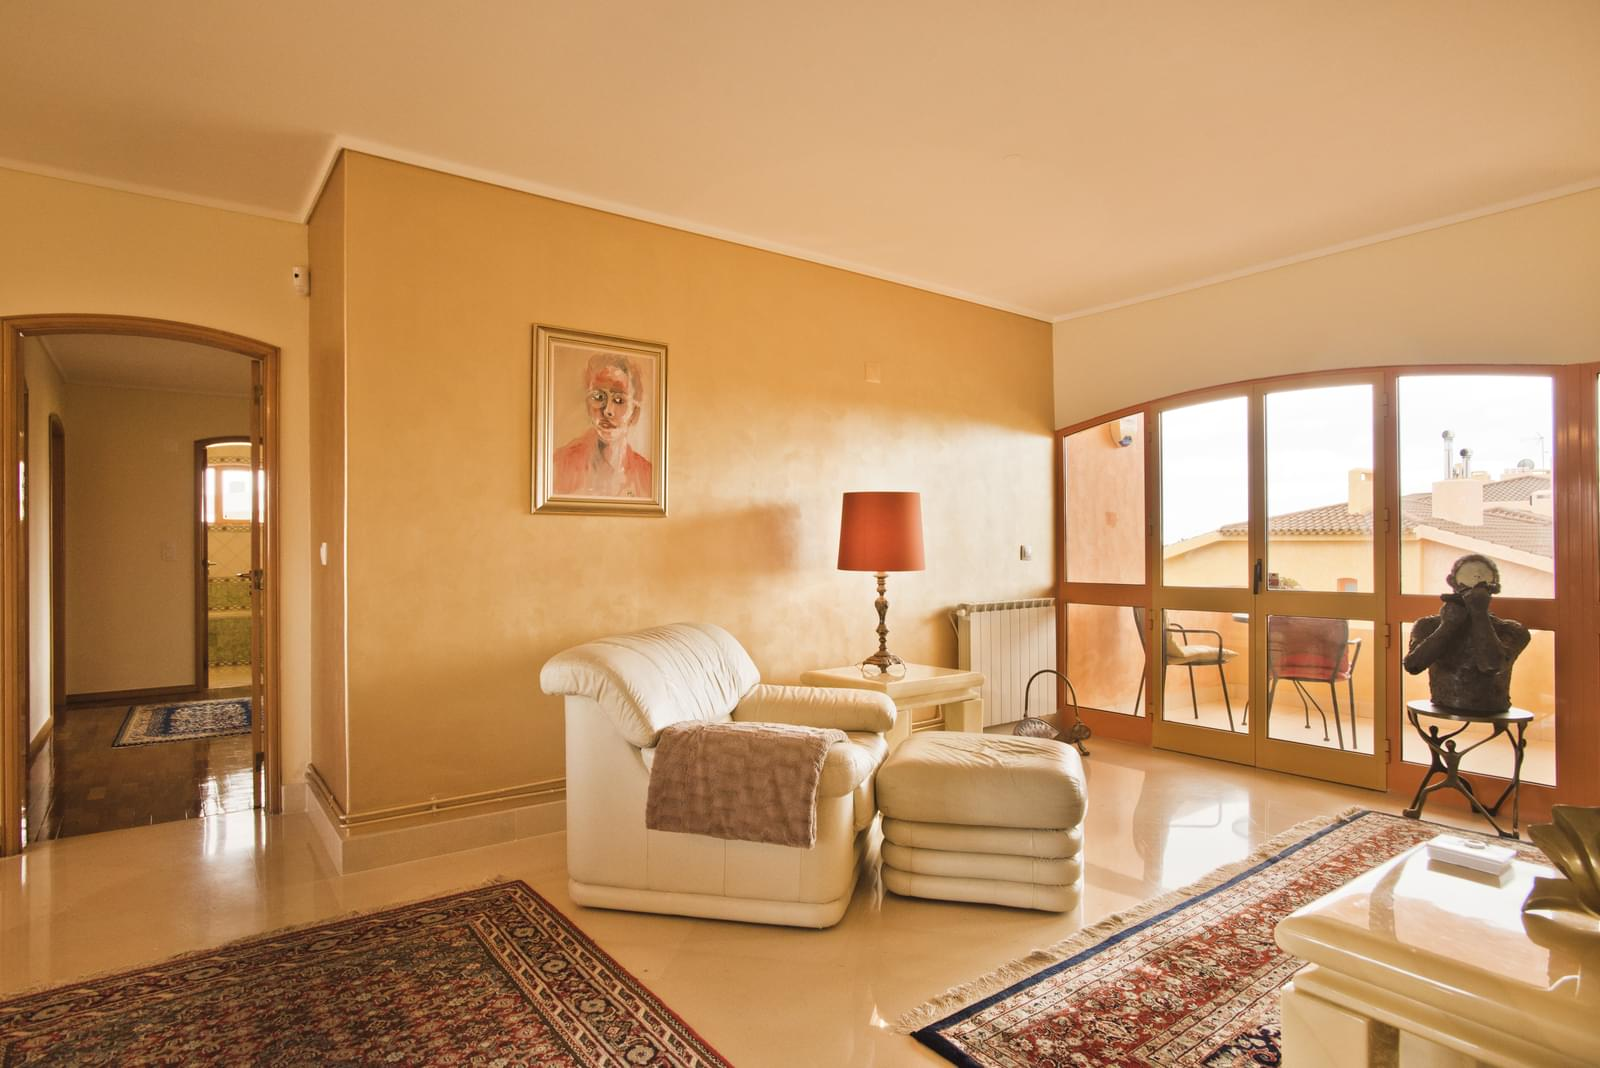 pf17156-apartamento-t3-cascais-a55abf9f-8a44-4ce1-9221-ba485199655d